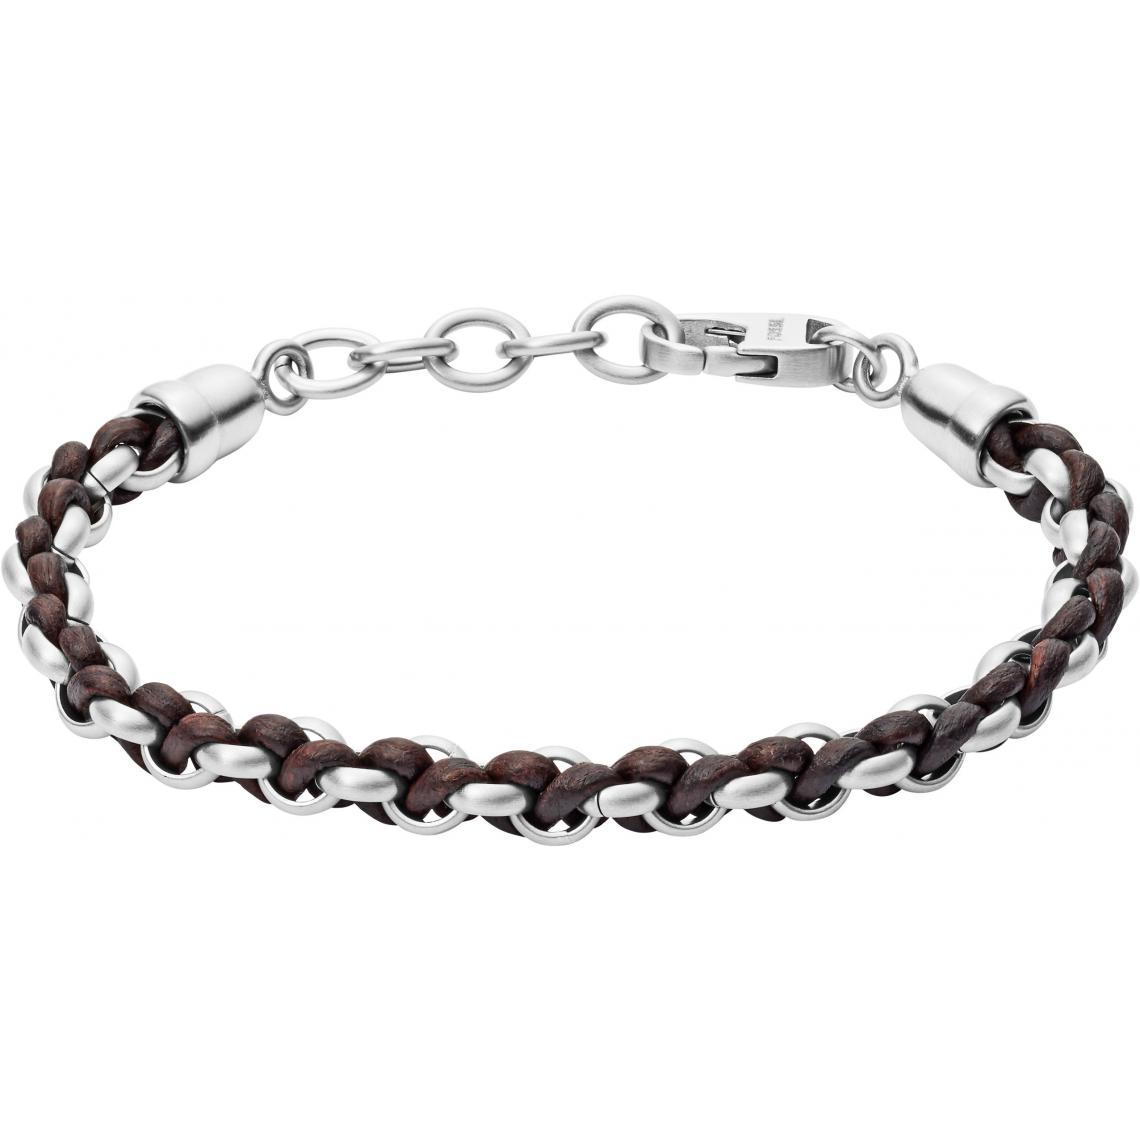 Promo : Bracelet JF02936040 - Bracelet Cuir Noir - Fossil Bijoux - Modalova